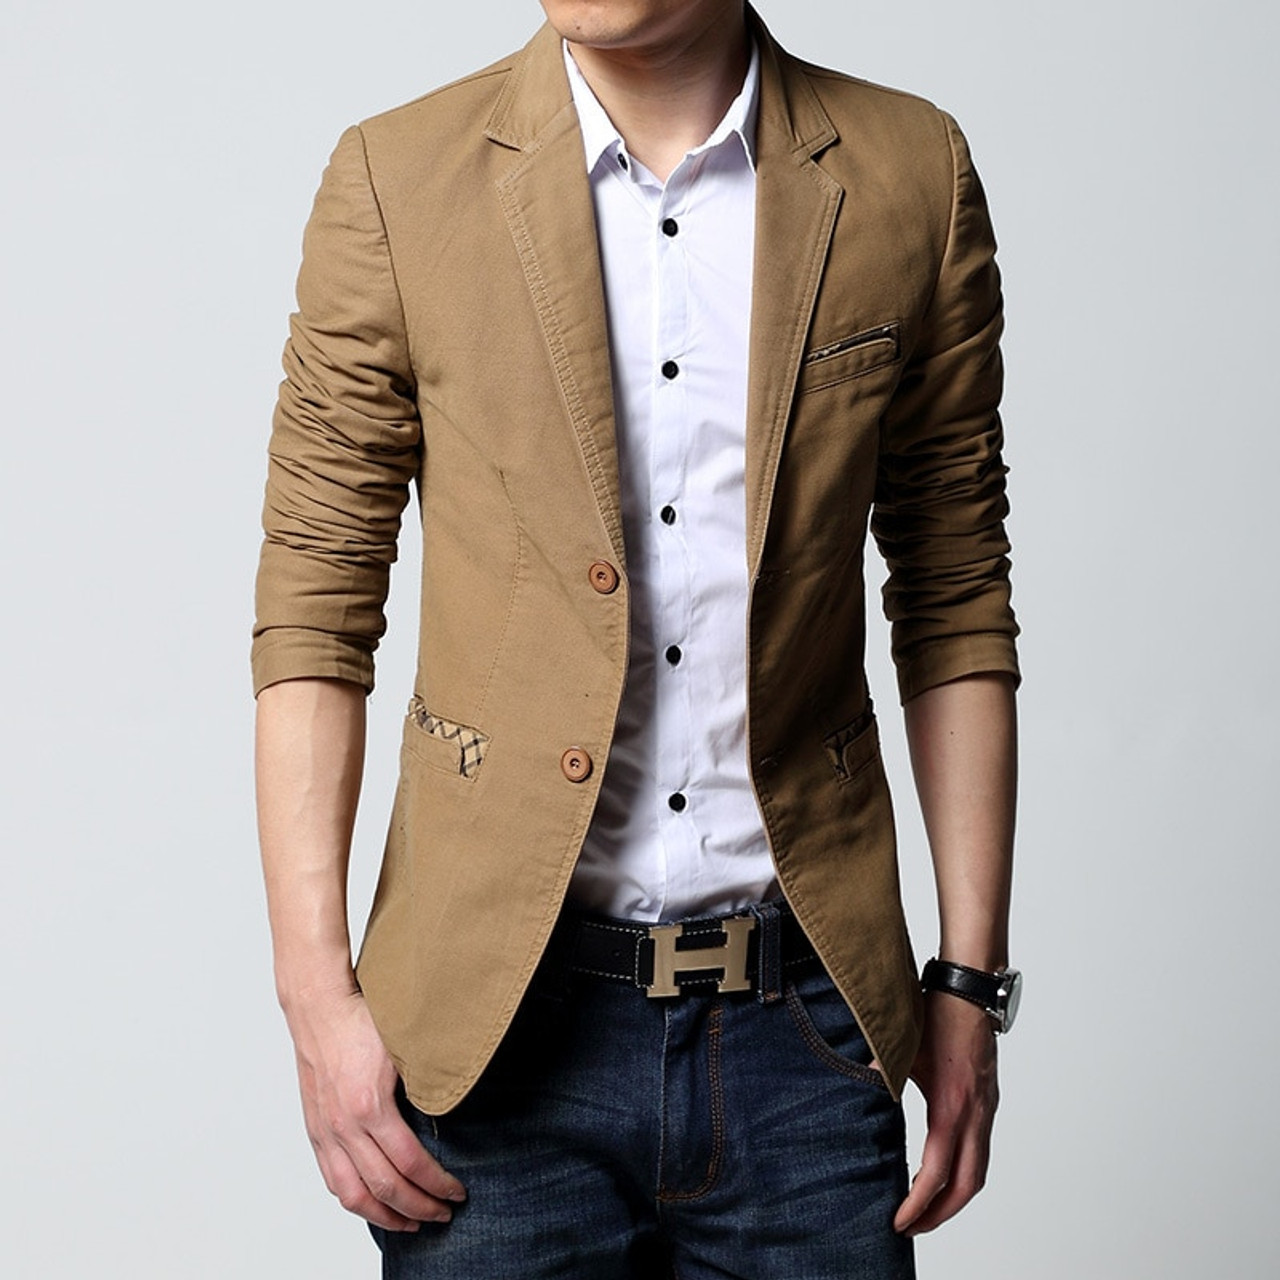 249eb8cbb0dea 2019 brand casual jacket terno masculino Men s Slim Fit blazer Black Coat  Fashion One button khaki ...